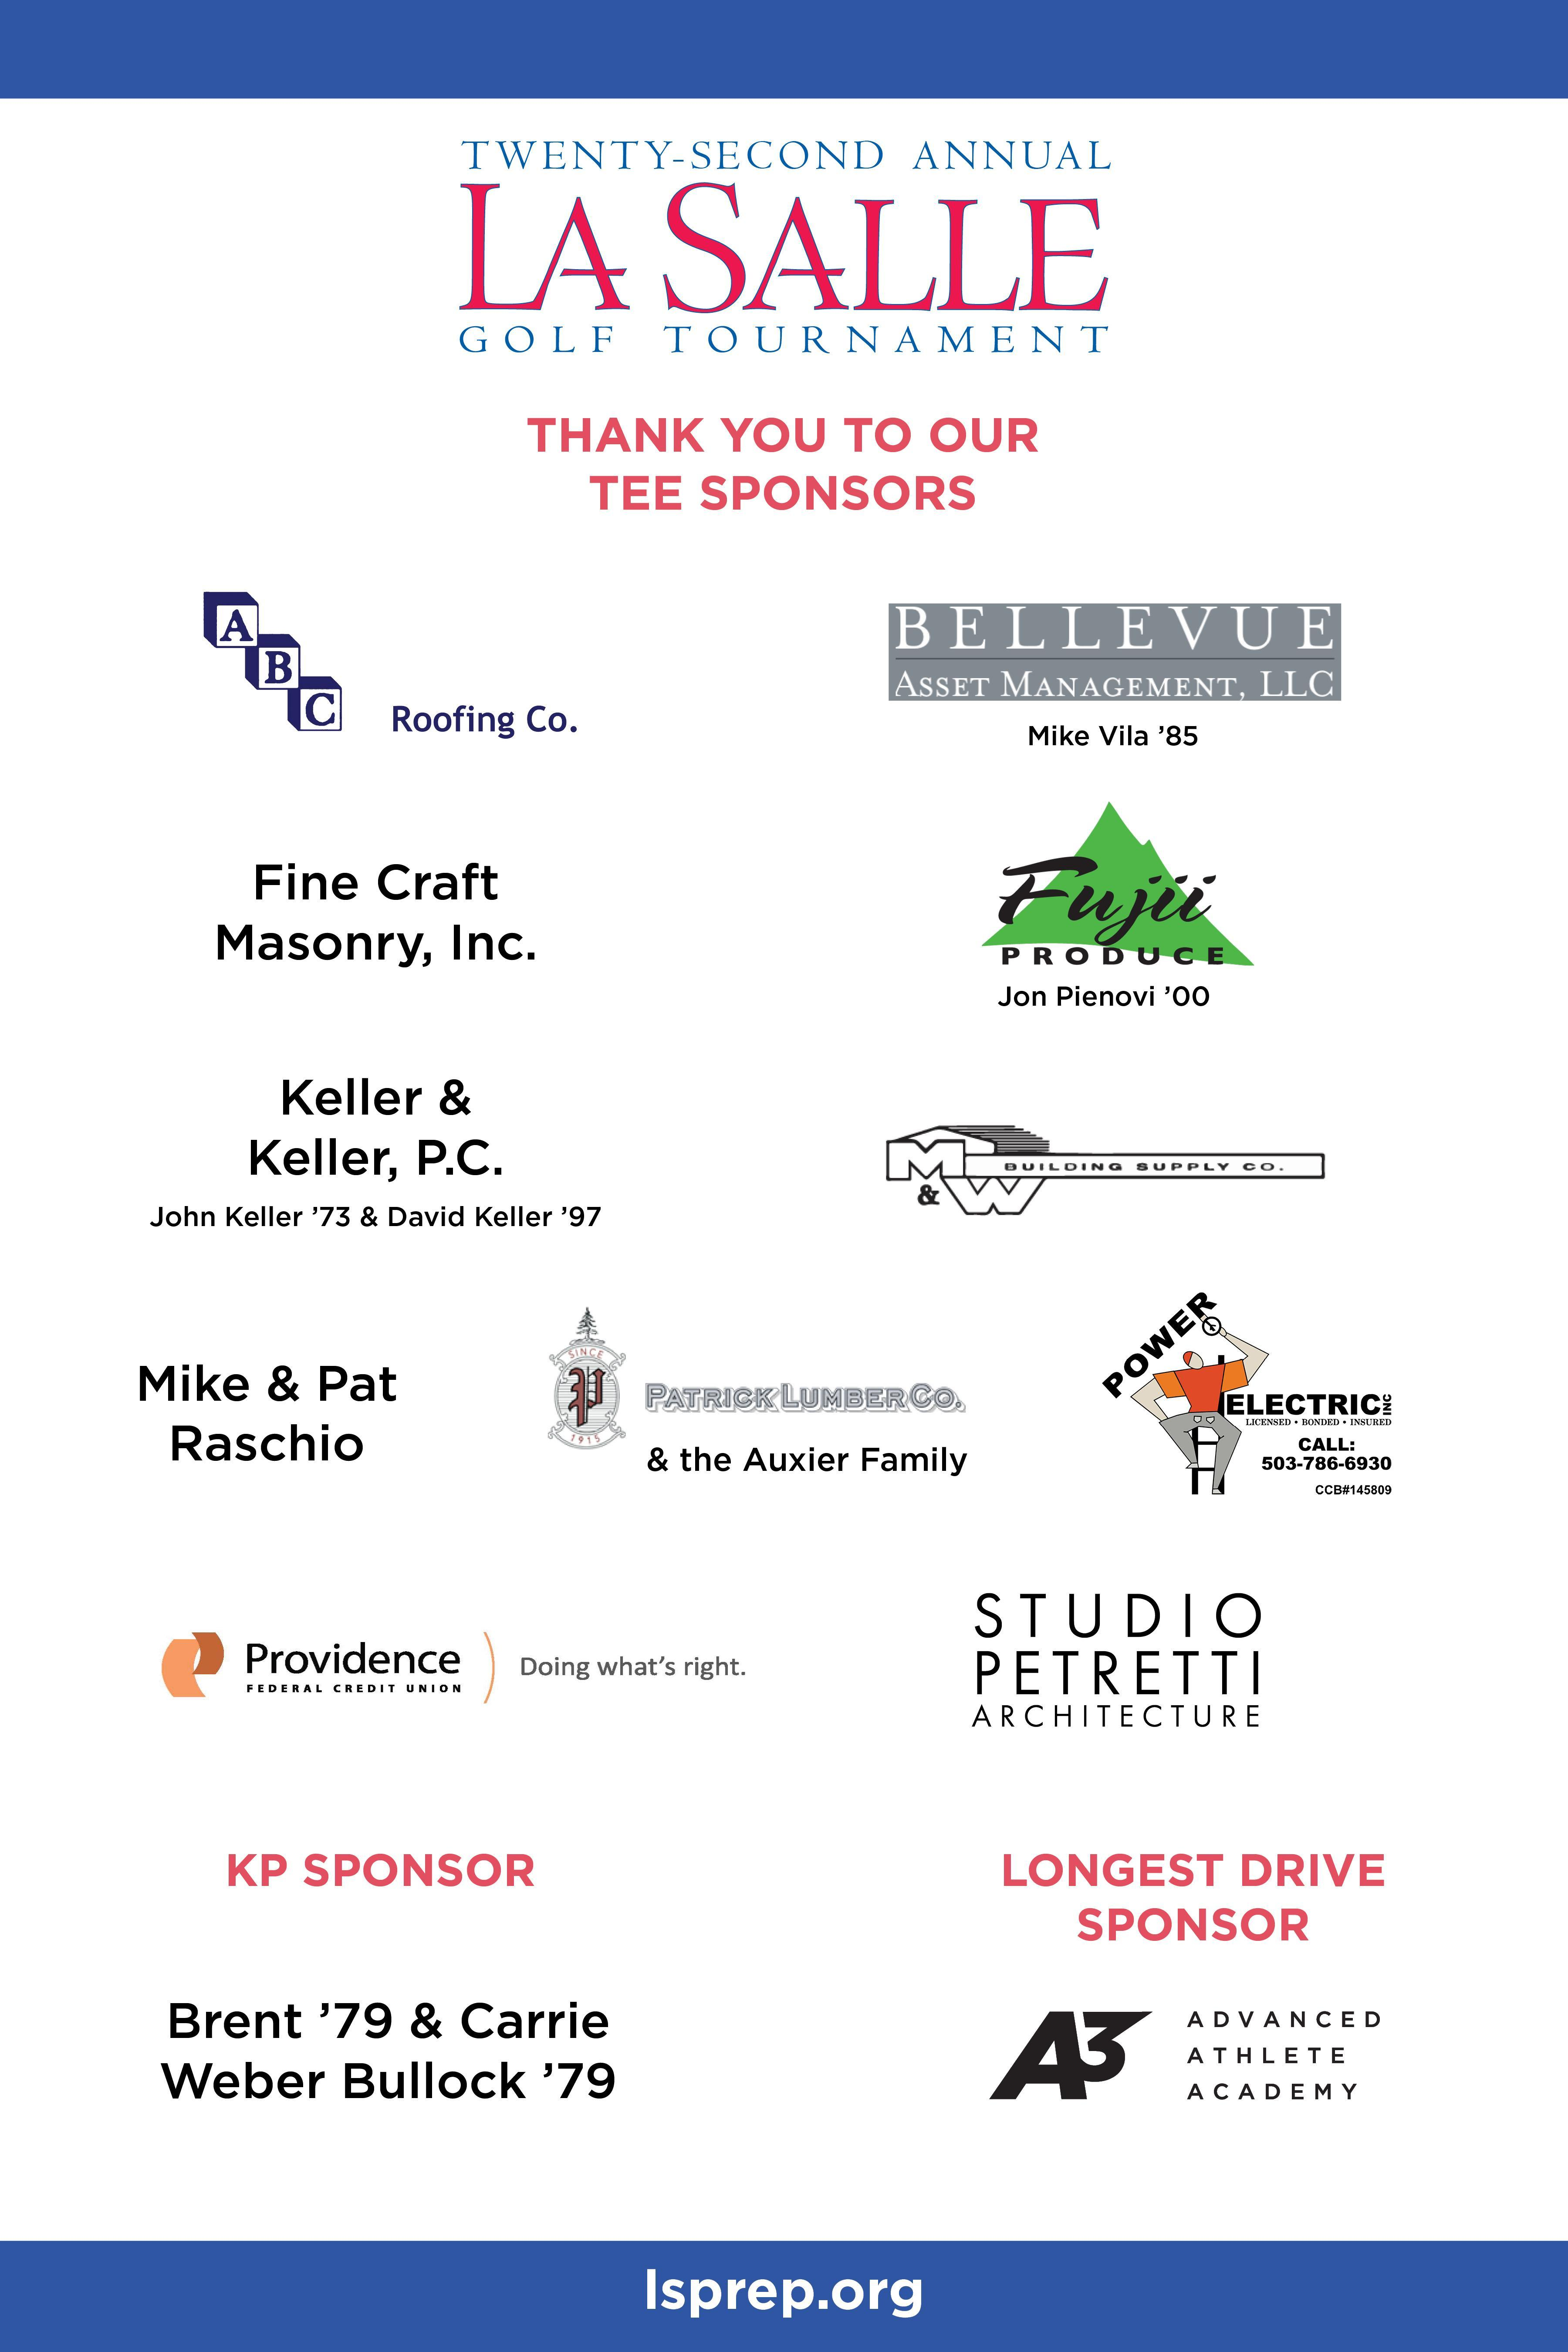 hole sponsor logos poster